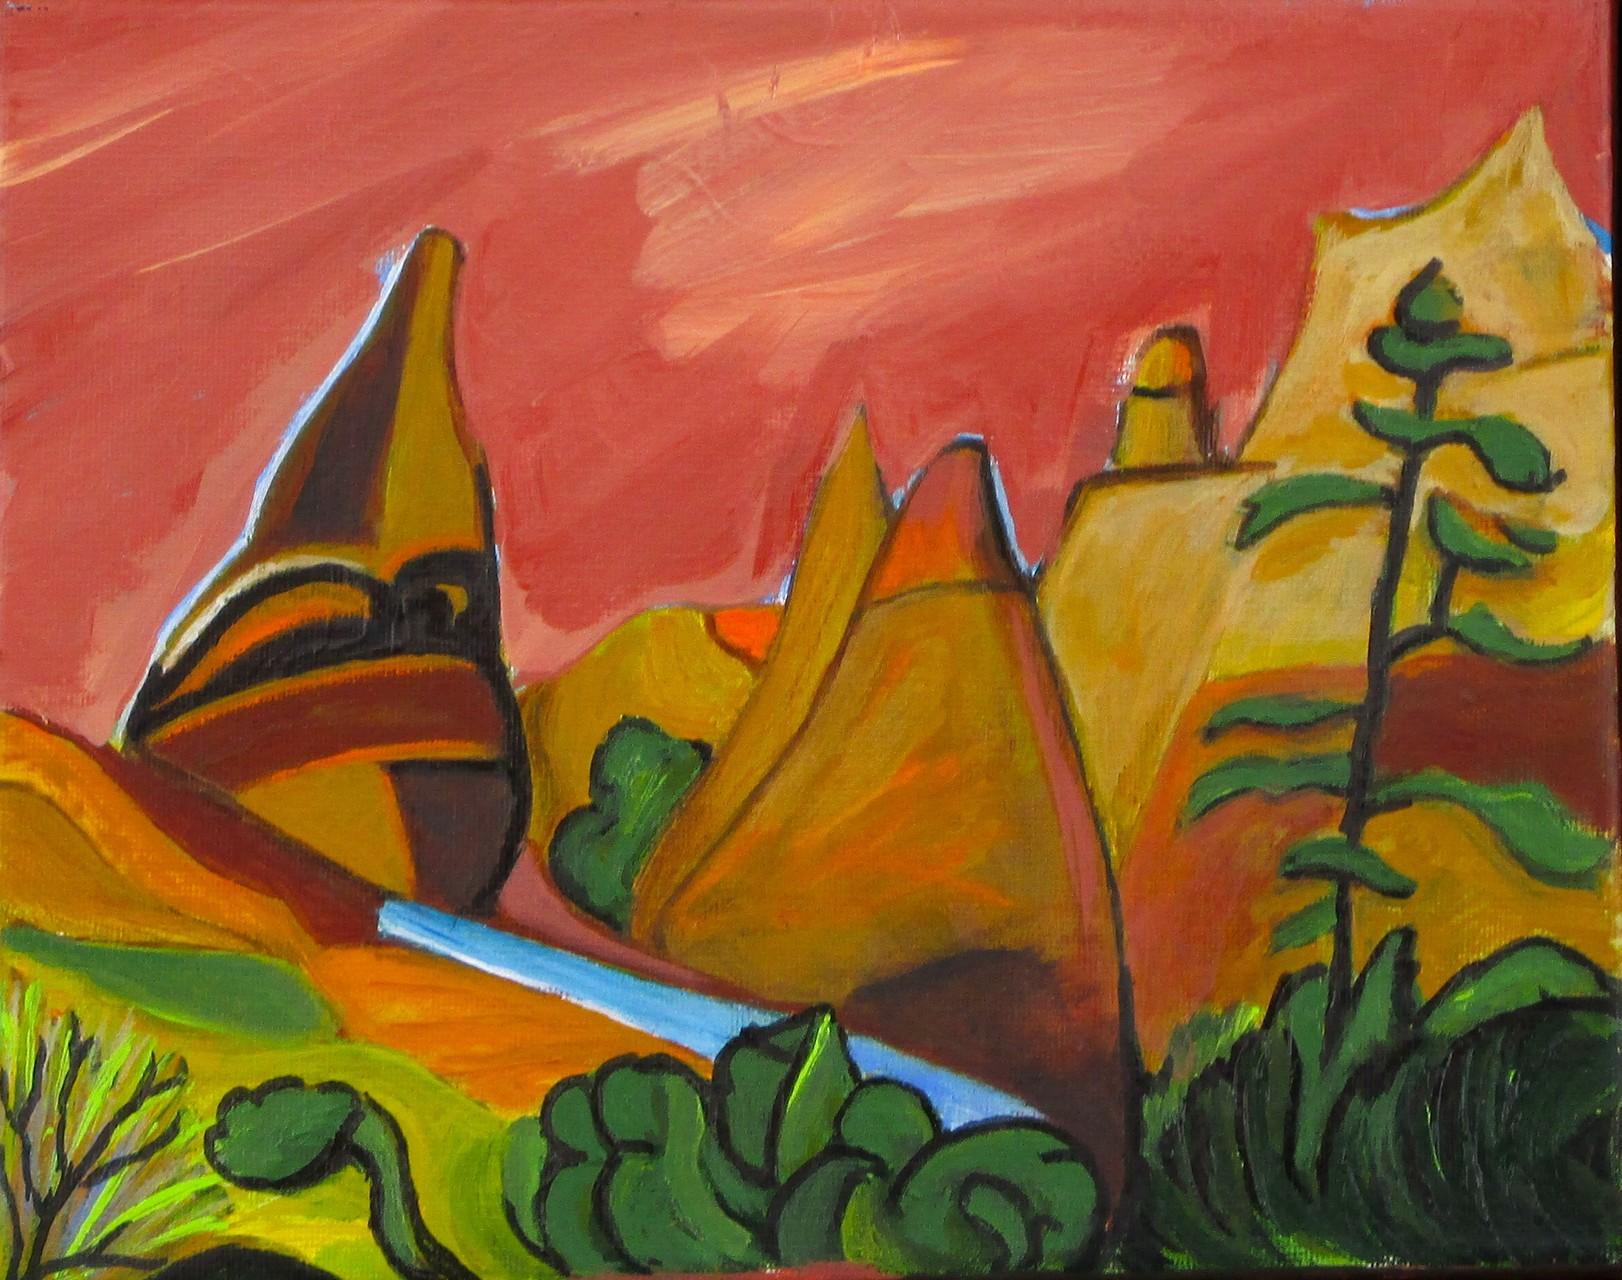 Tent Rocks, oil on canvas, 12 x 9, 2014